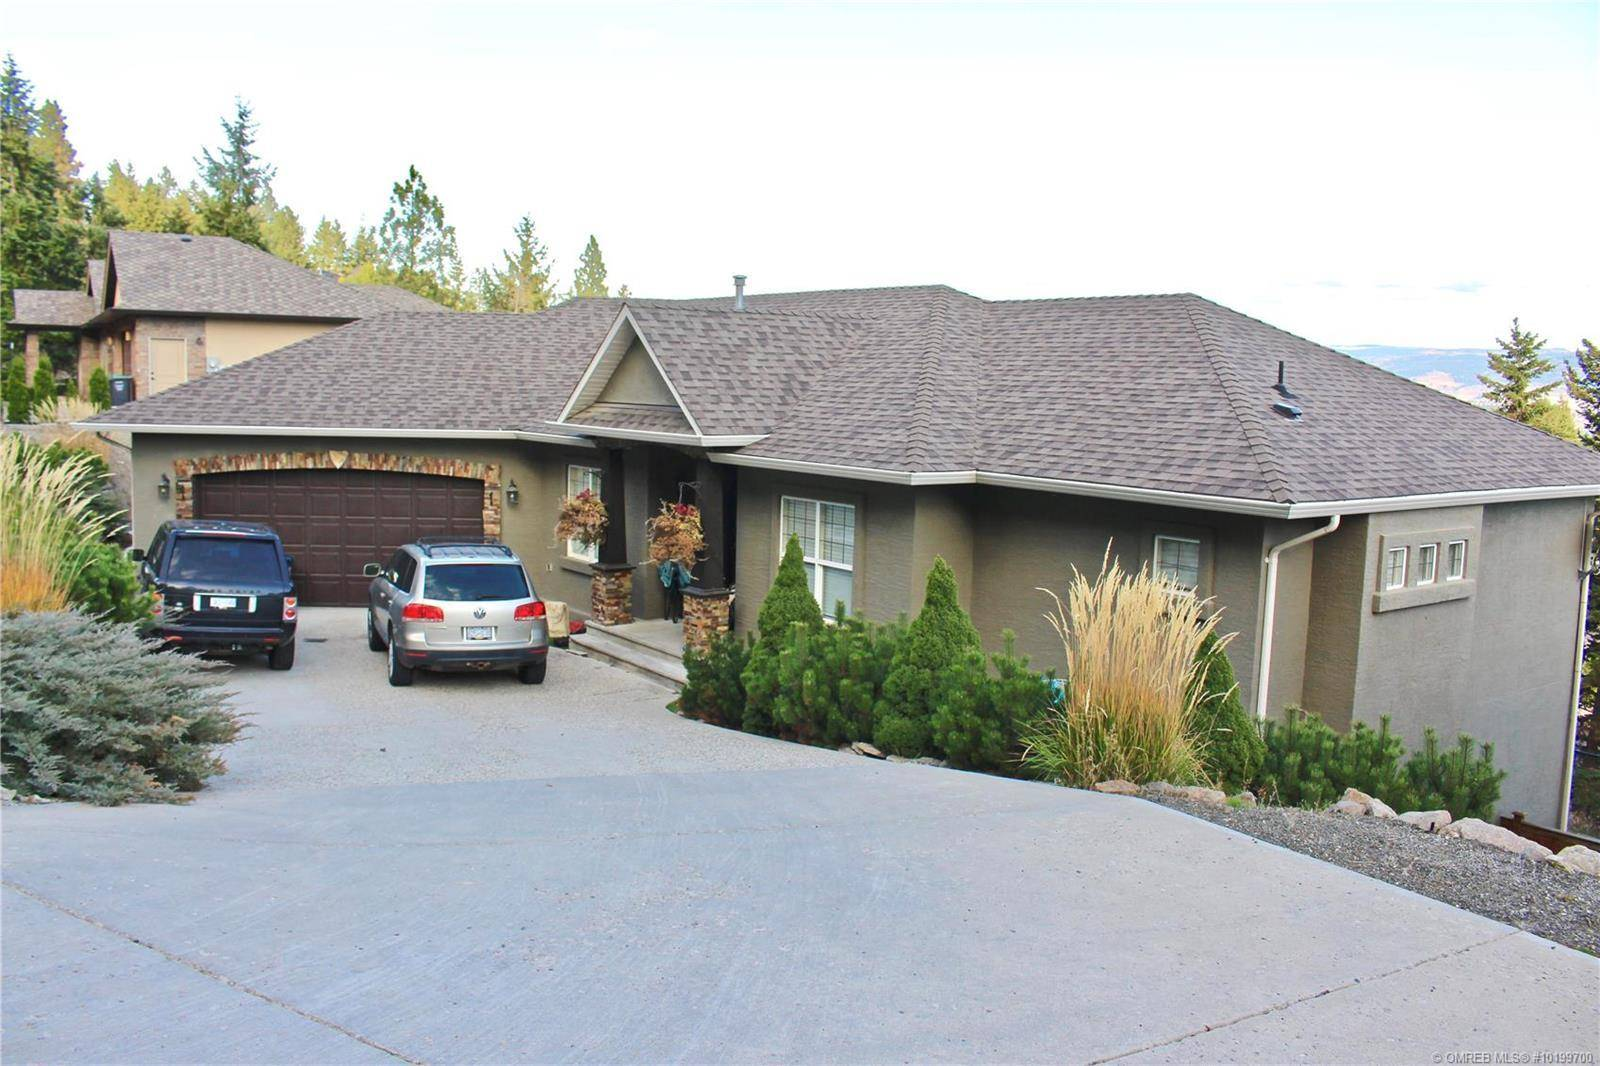 House for sale at 1007 Aurora Ht West Kelowna British Columbia - MLS: 10199700